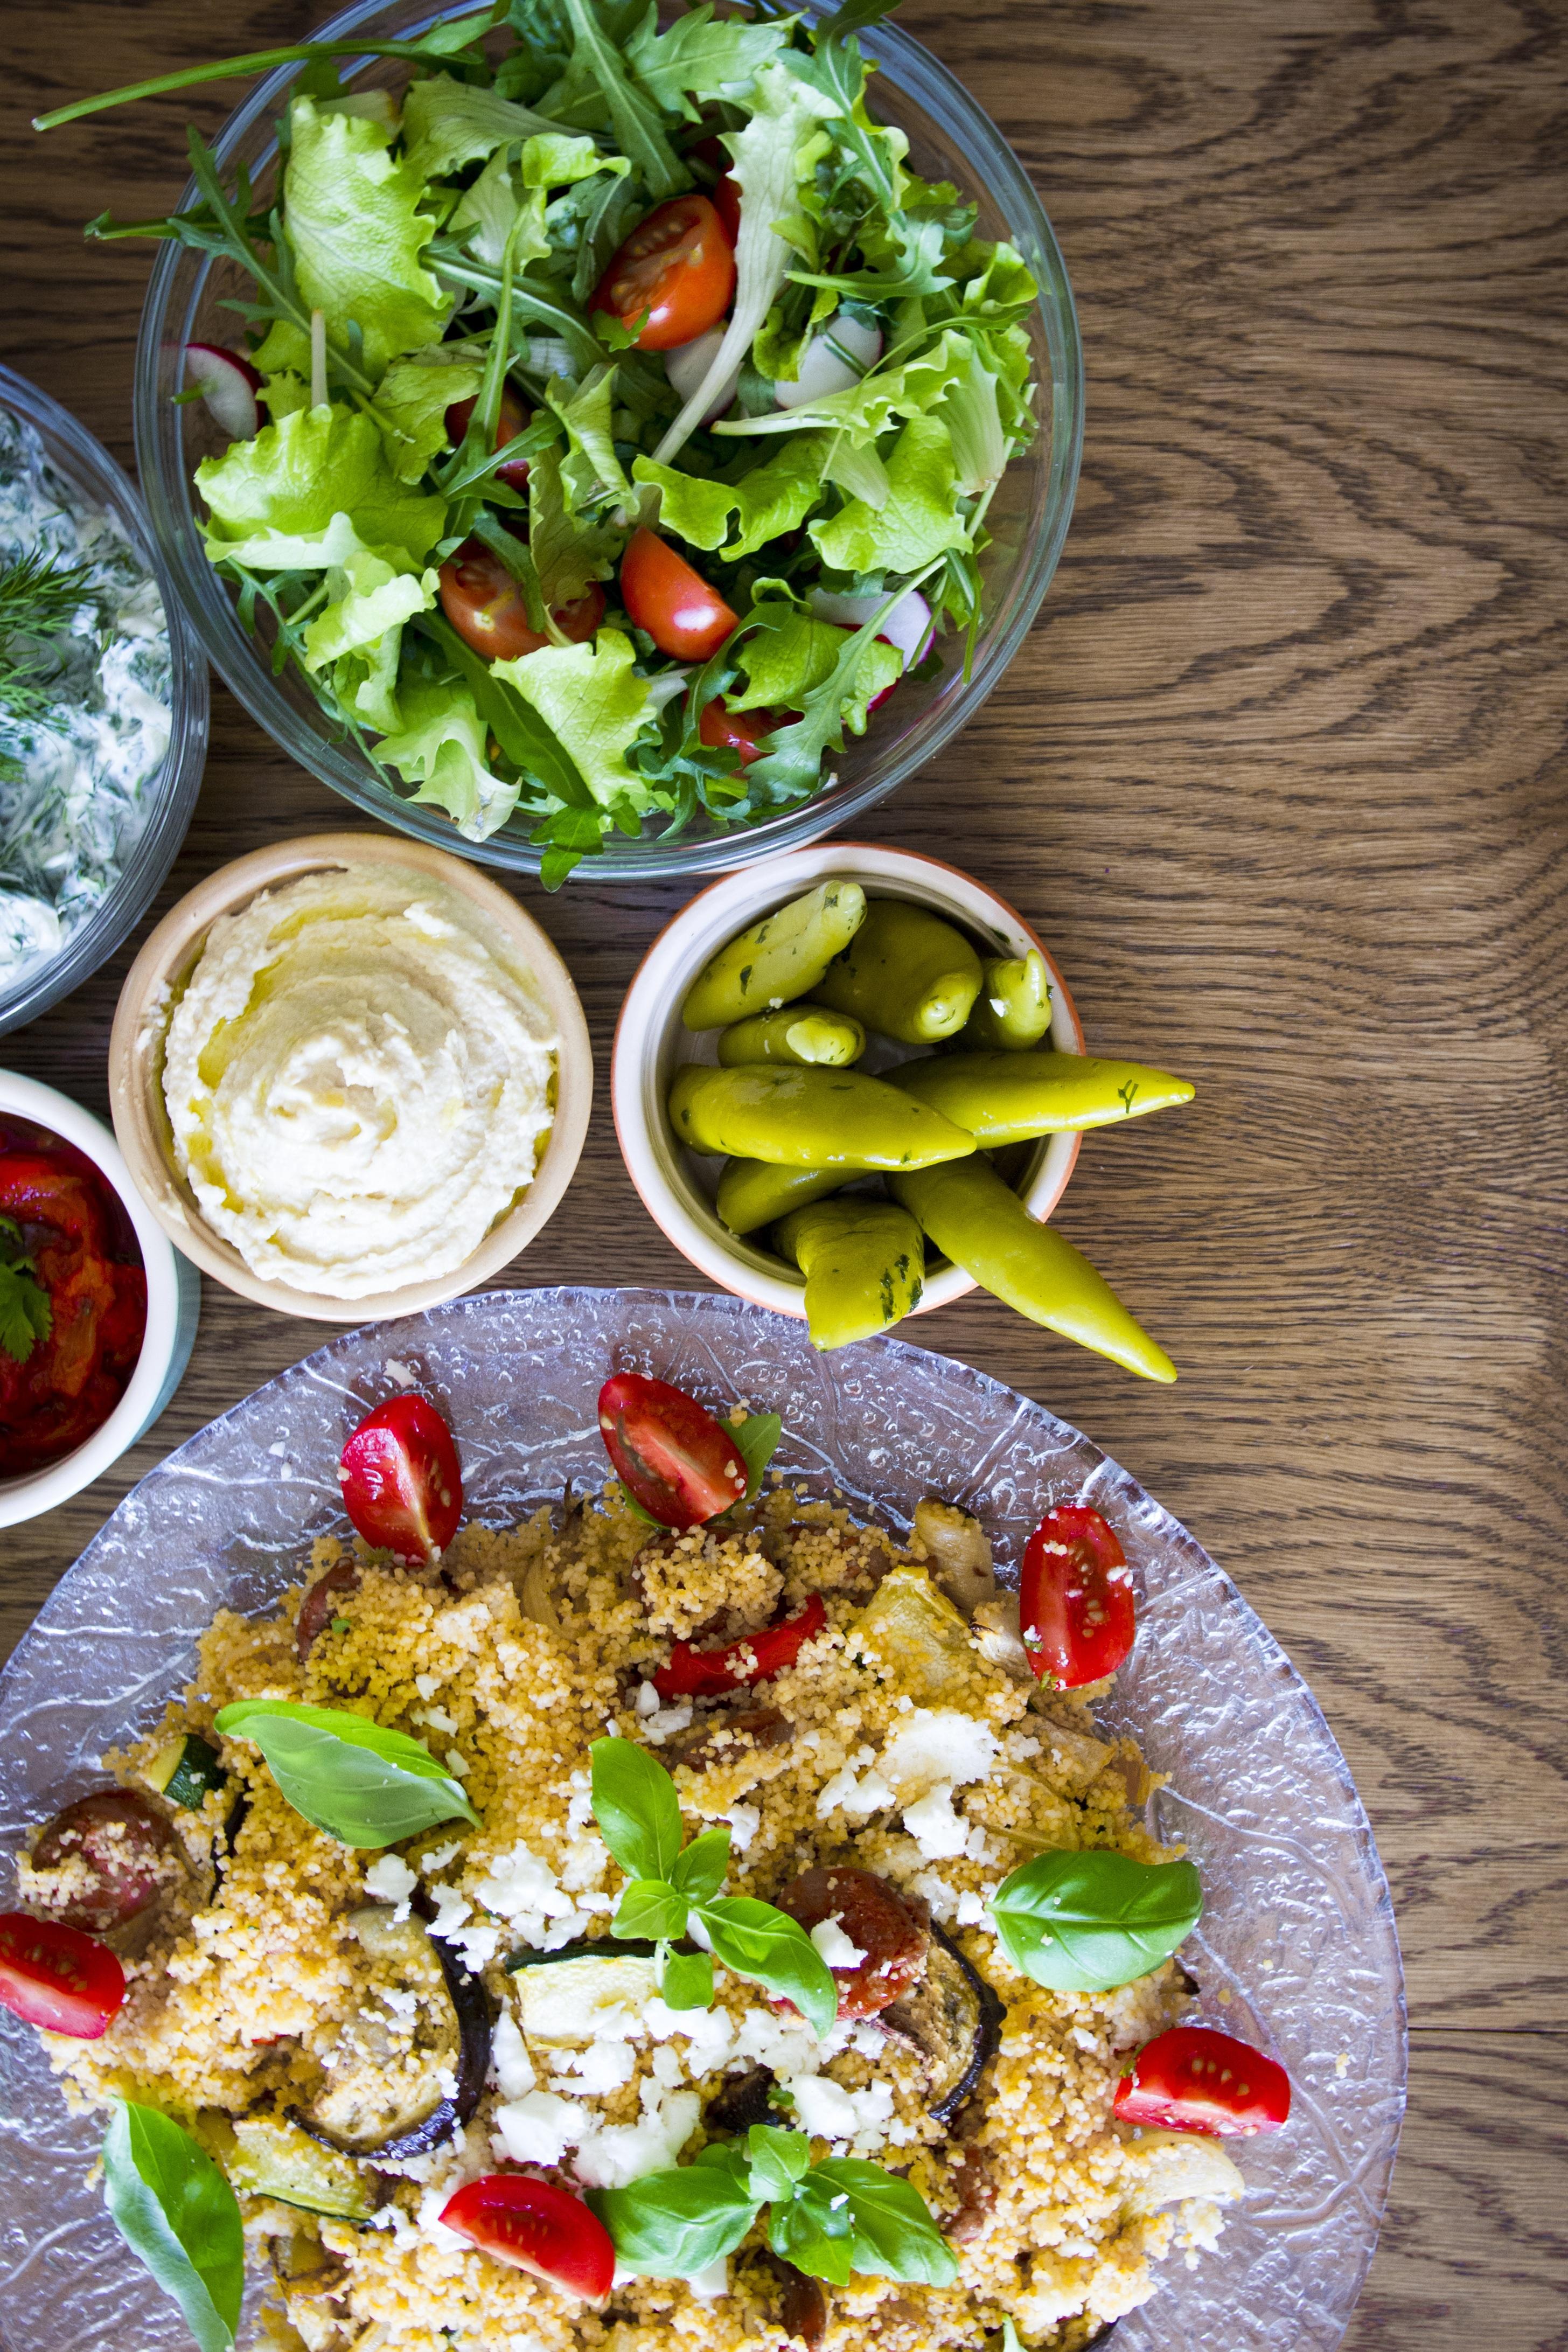 Fotos gratis : mesa, inmersión, verano, plato, ensalada ...